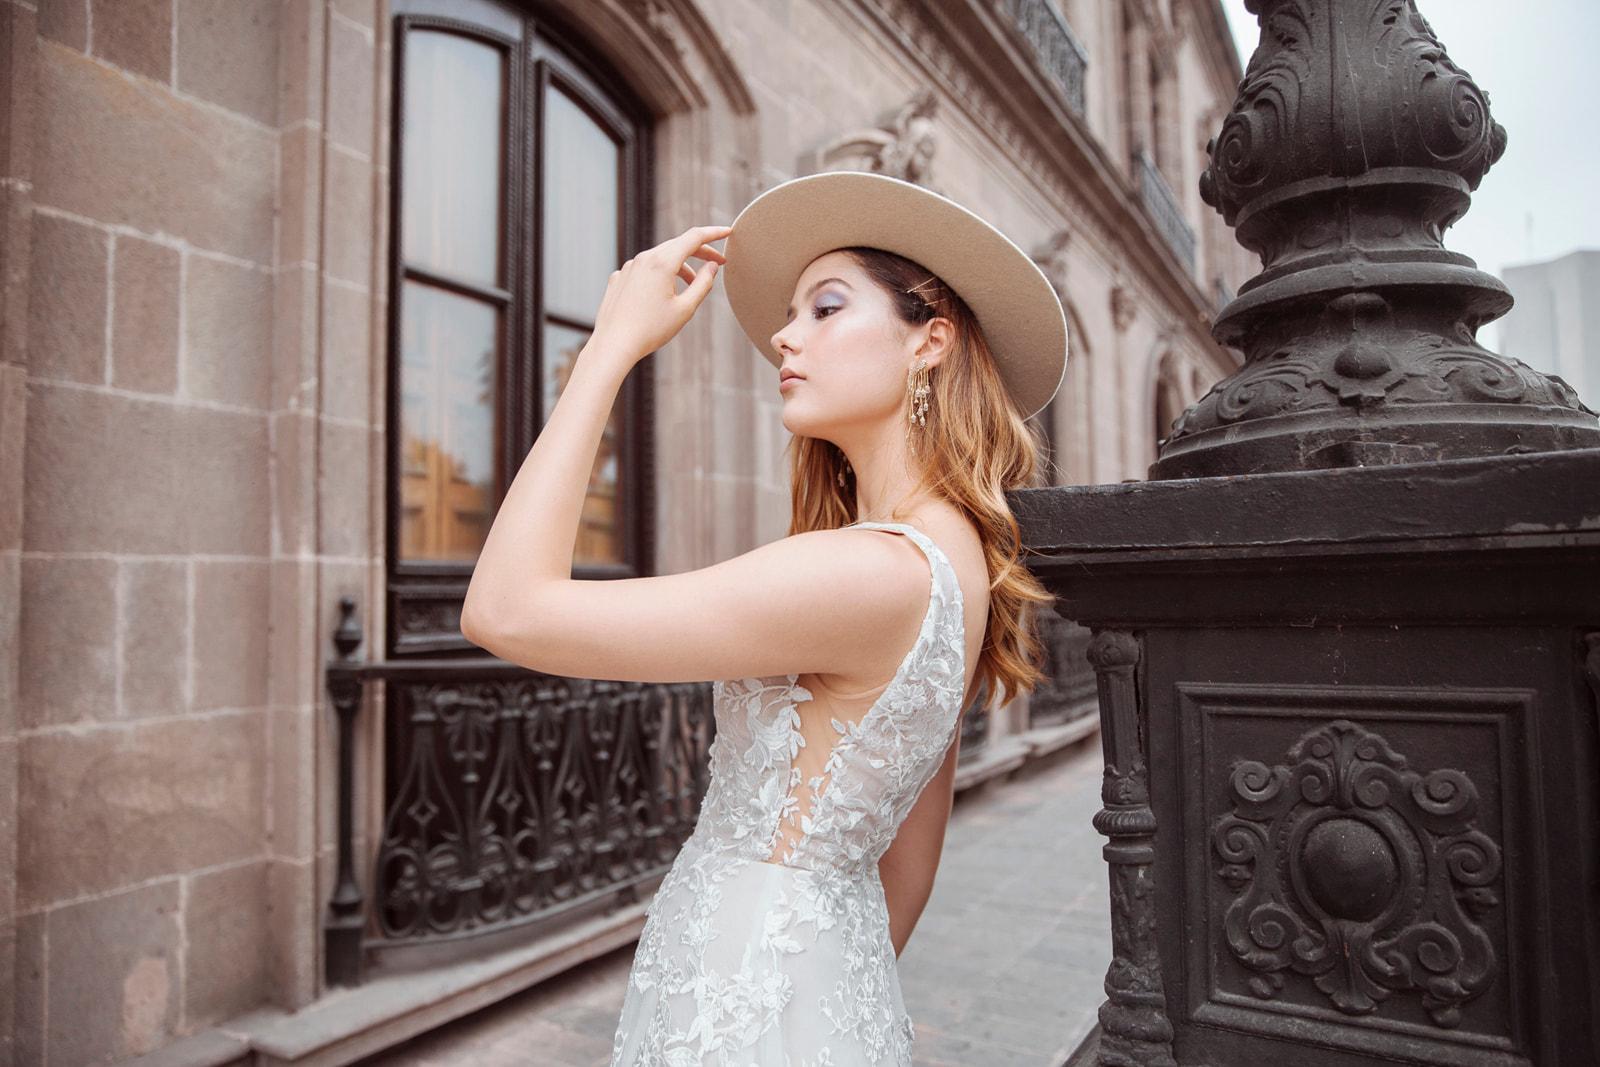 Carlotta_dress_(20_of_58).jpg